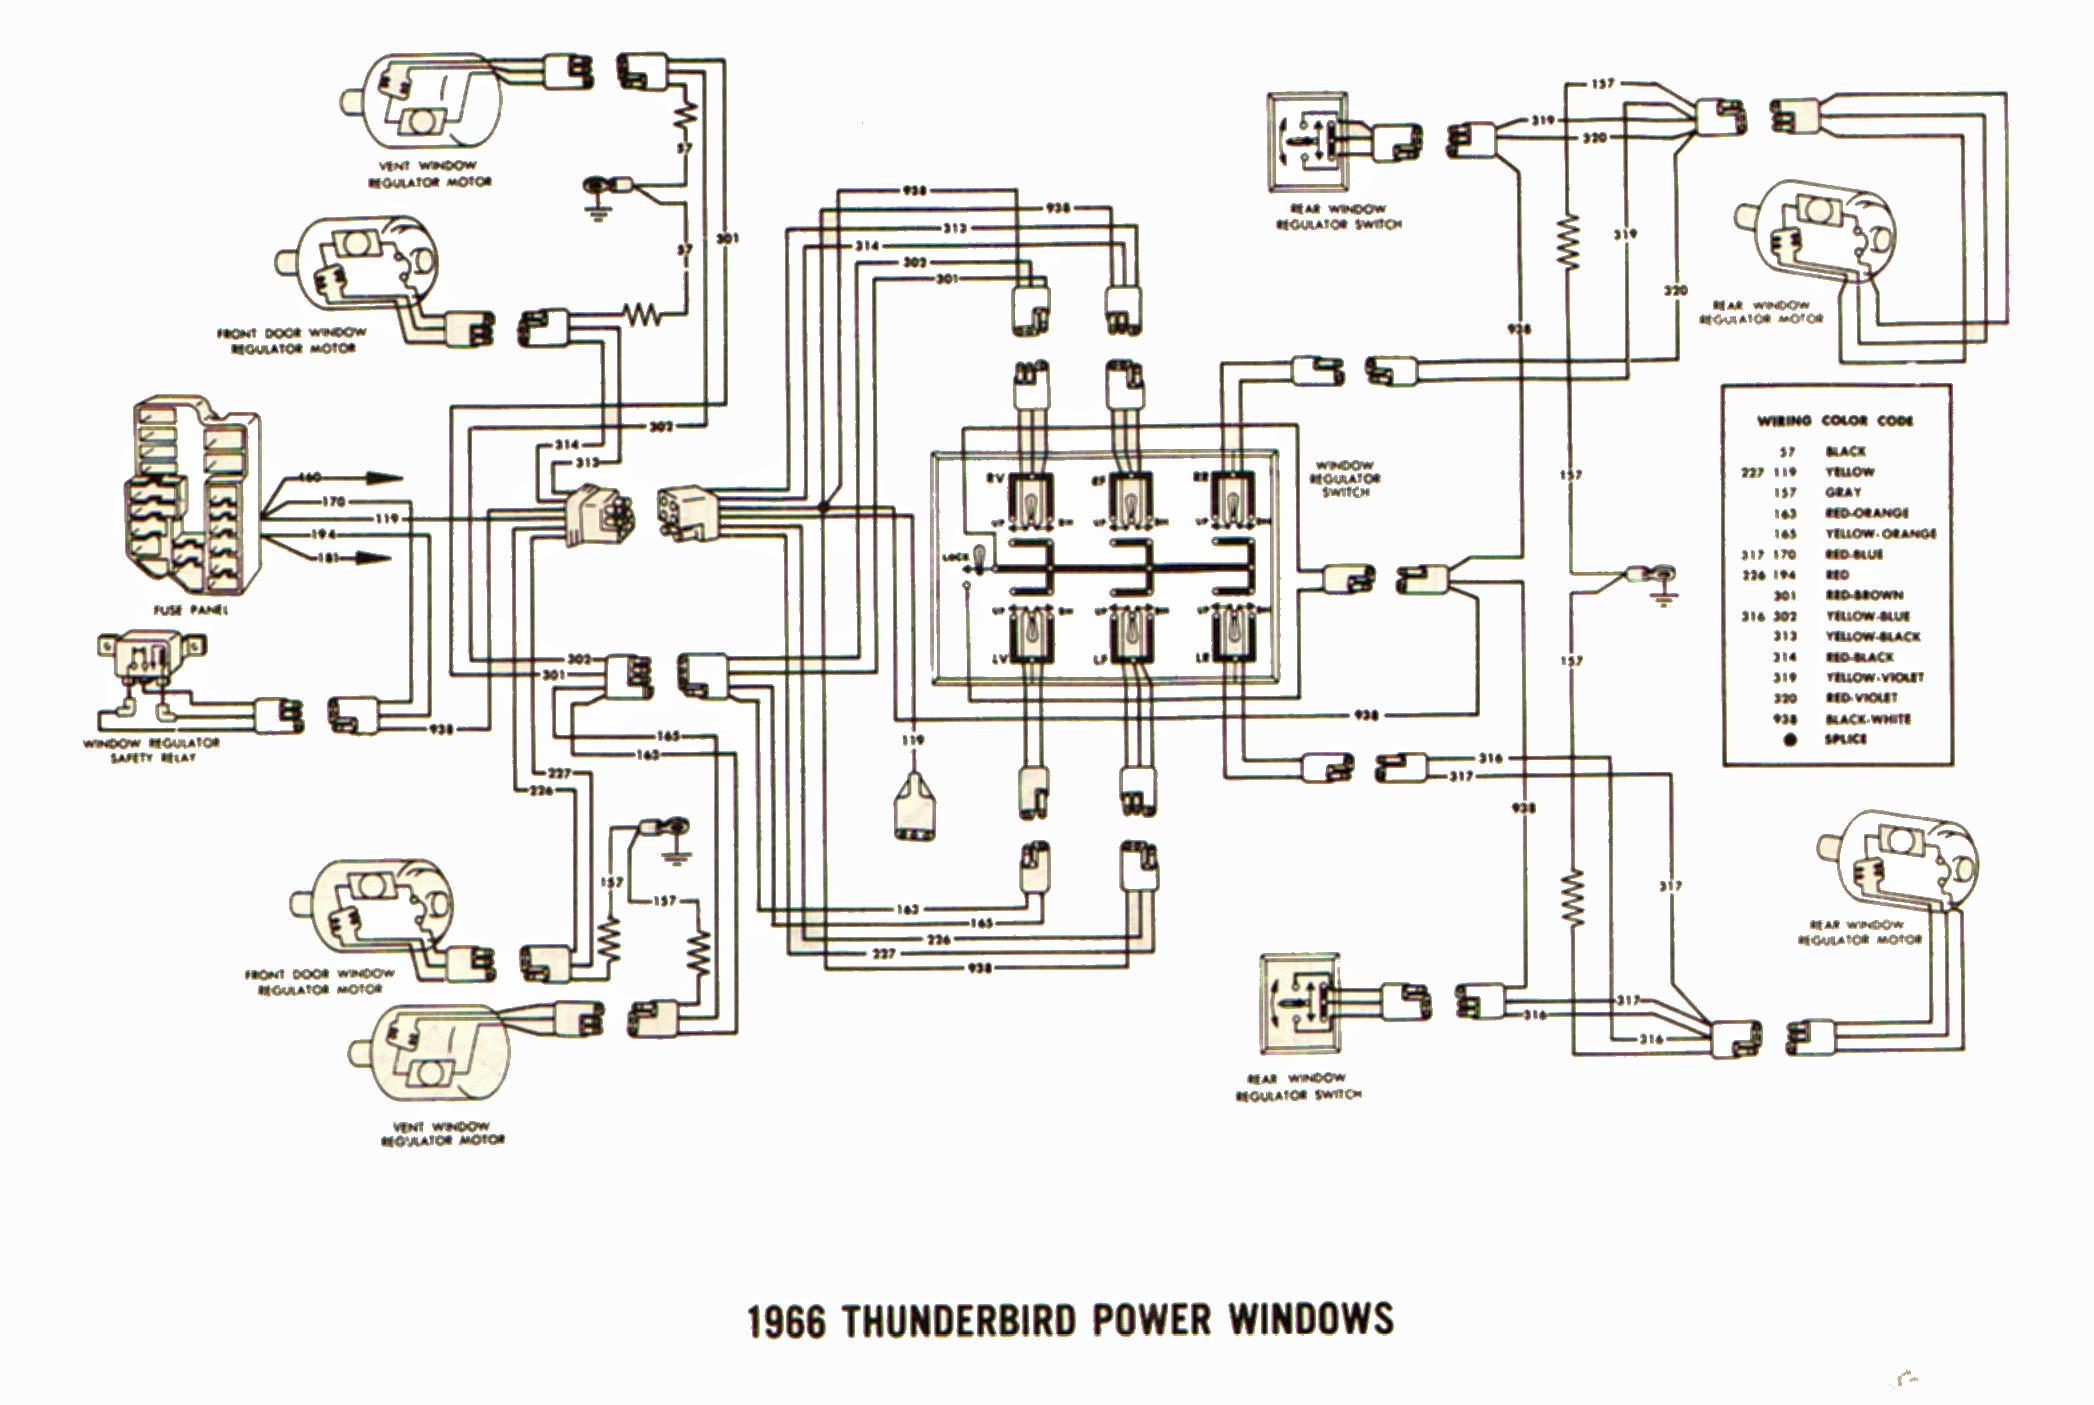 1970 ford thunderbird fuse box diagram wiring diagram 2003 ford thunderbird fuse box diagram 1956 thunderbird wiring diagram